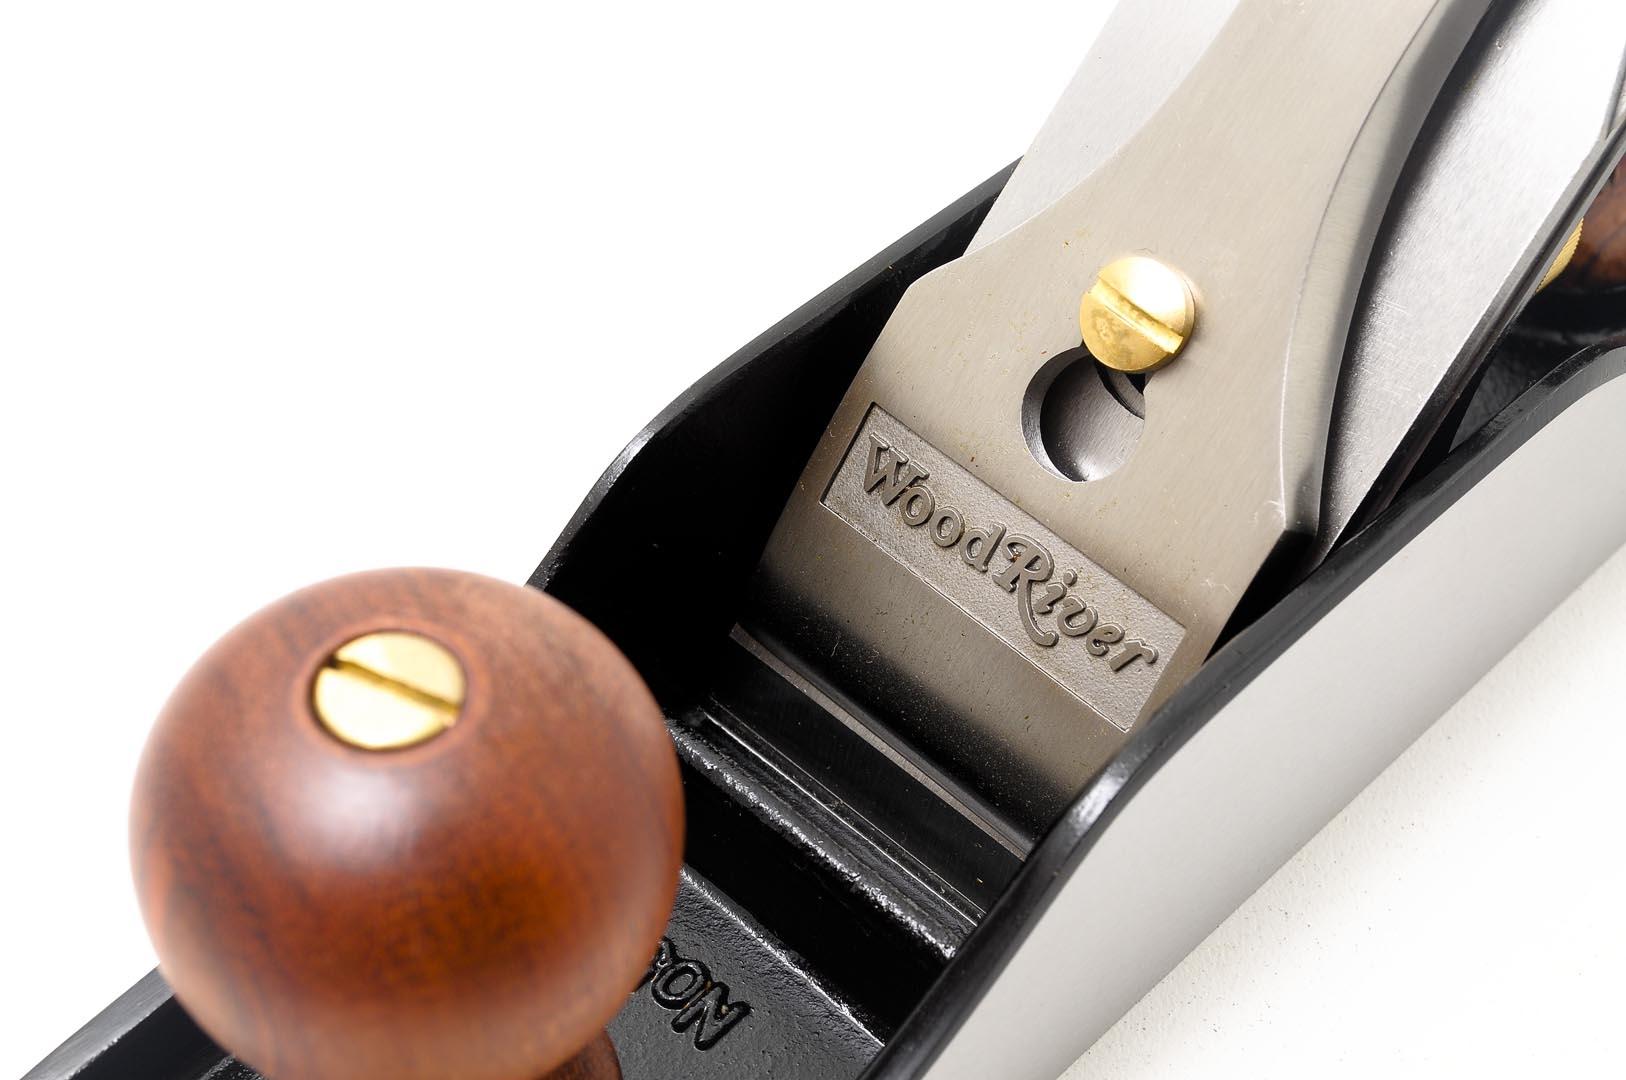 150875-Cepillo 5 bedrock garlopin para carpinteria WoodRiver 150875-max-2.